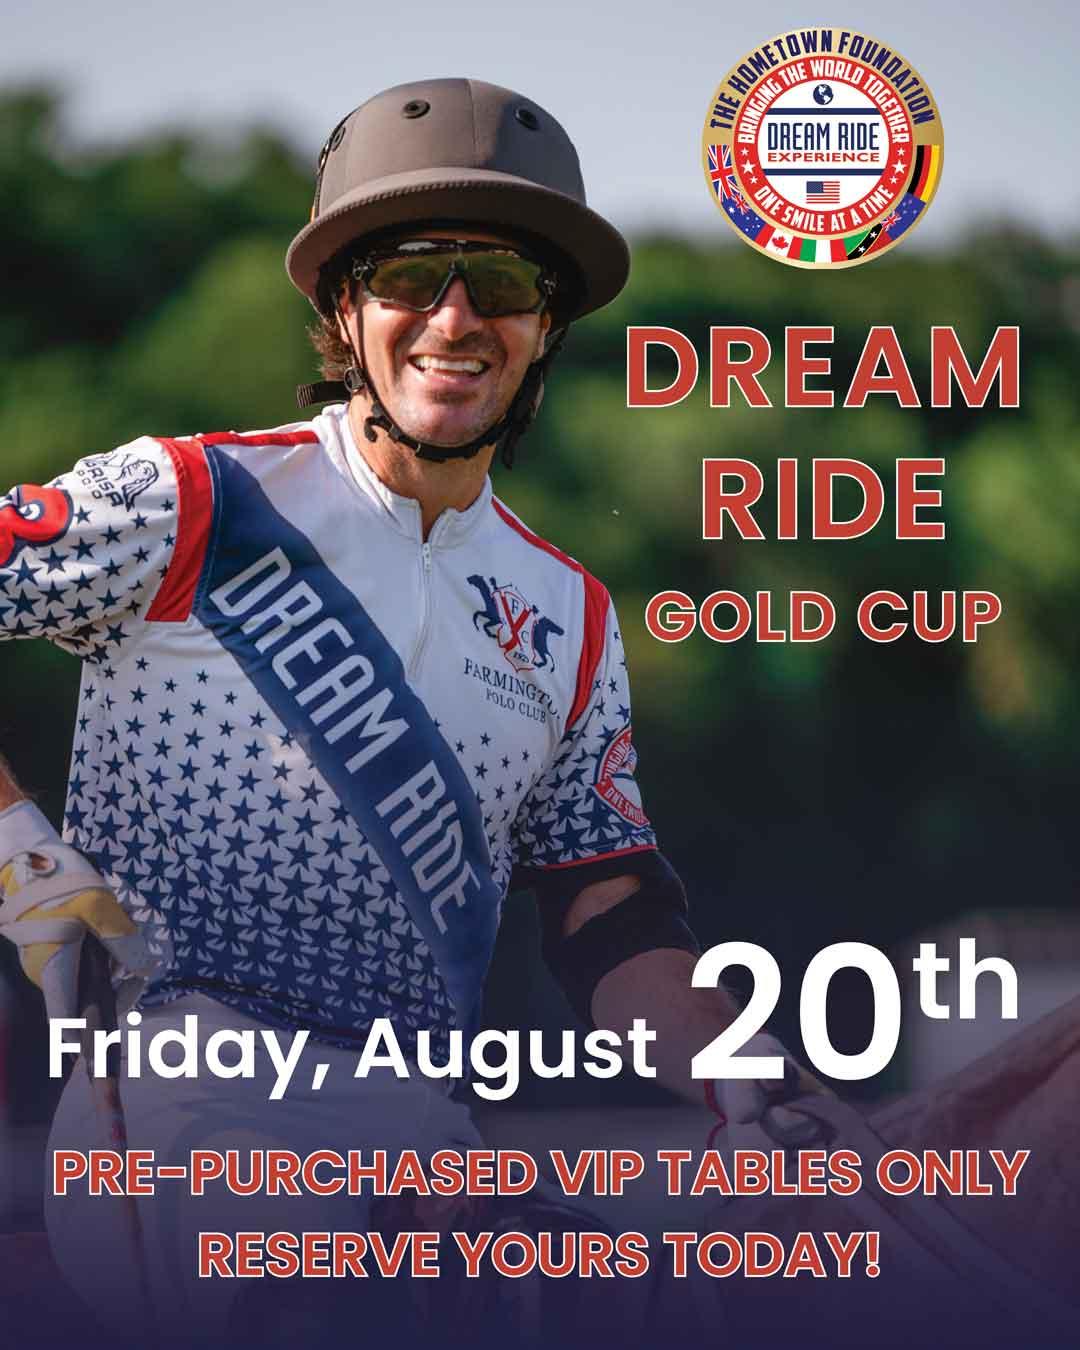 Dream Ride Gold Cup